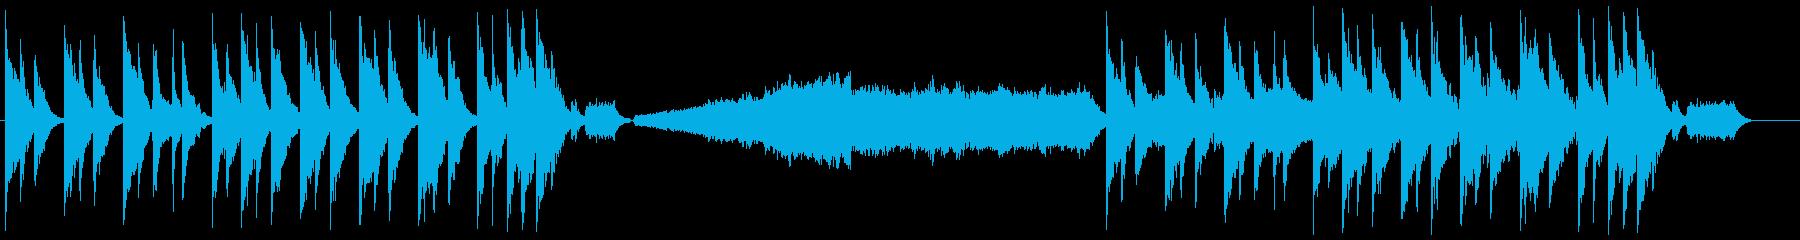 Abient Pianoの再生済みの波形